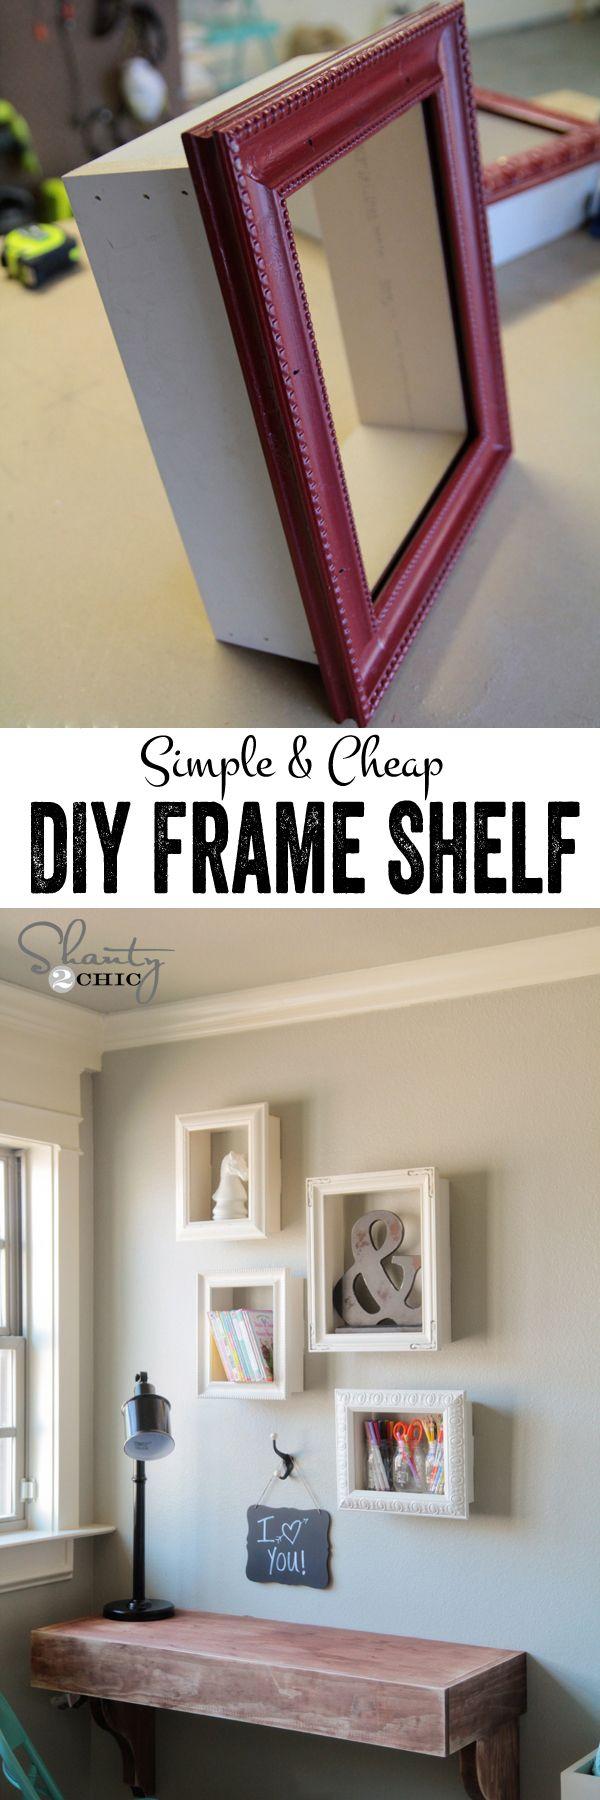 Diy frame shelves cheap frames display shelves and shelves diy frame shelves shanty 2 chic solutioingenieria Images